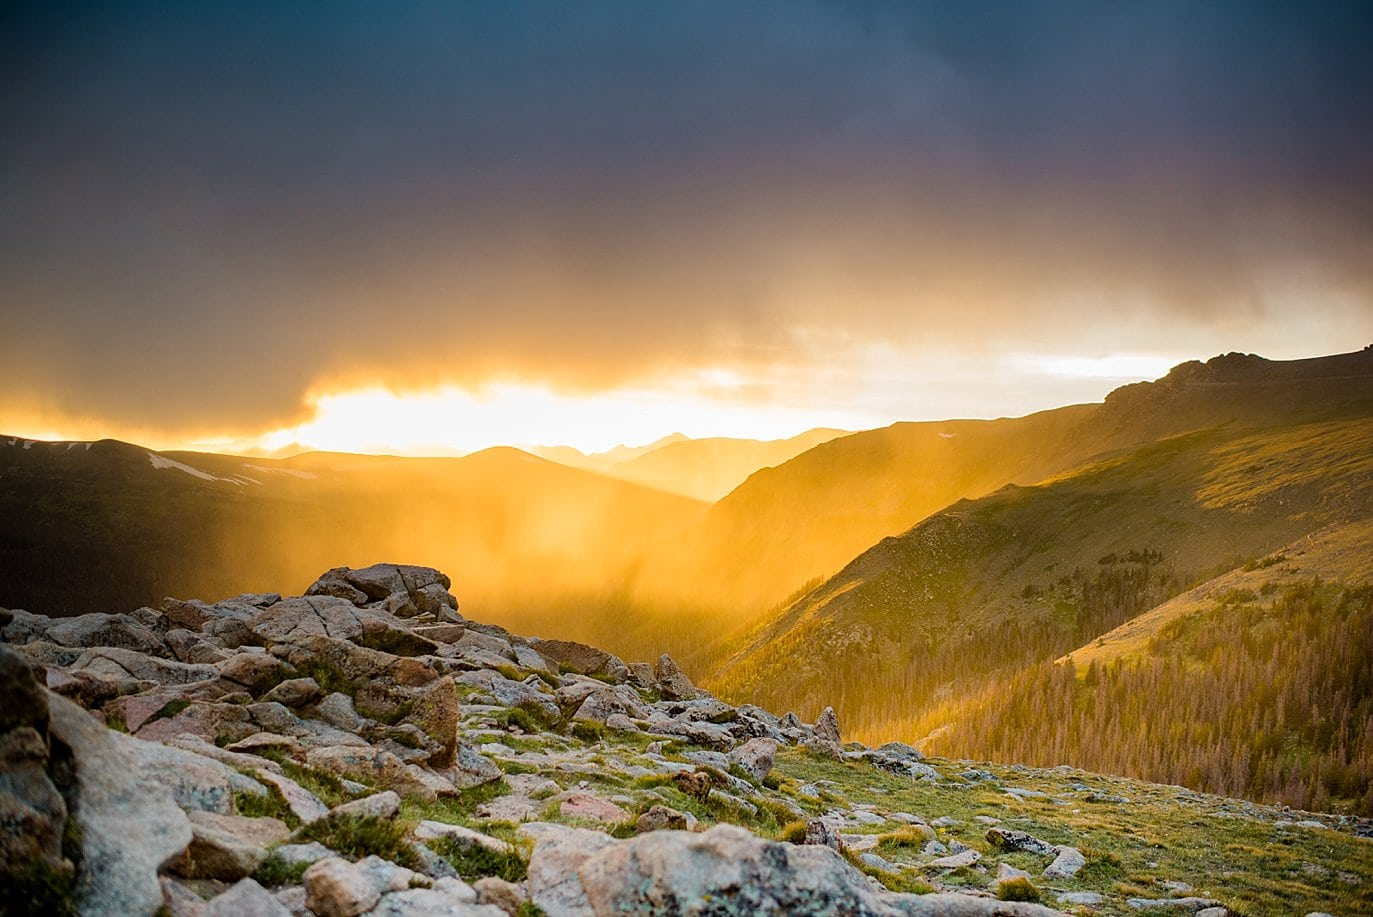 RMNP sunset photo